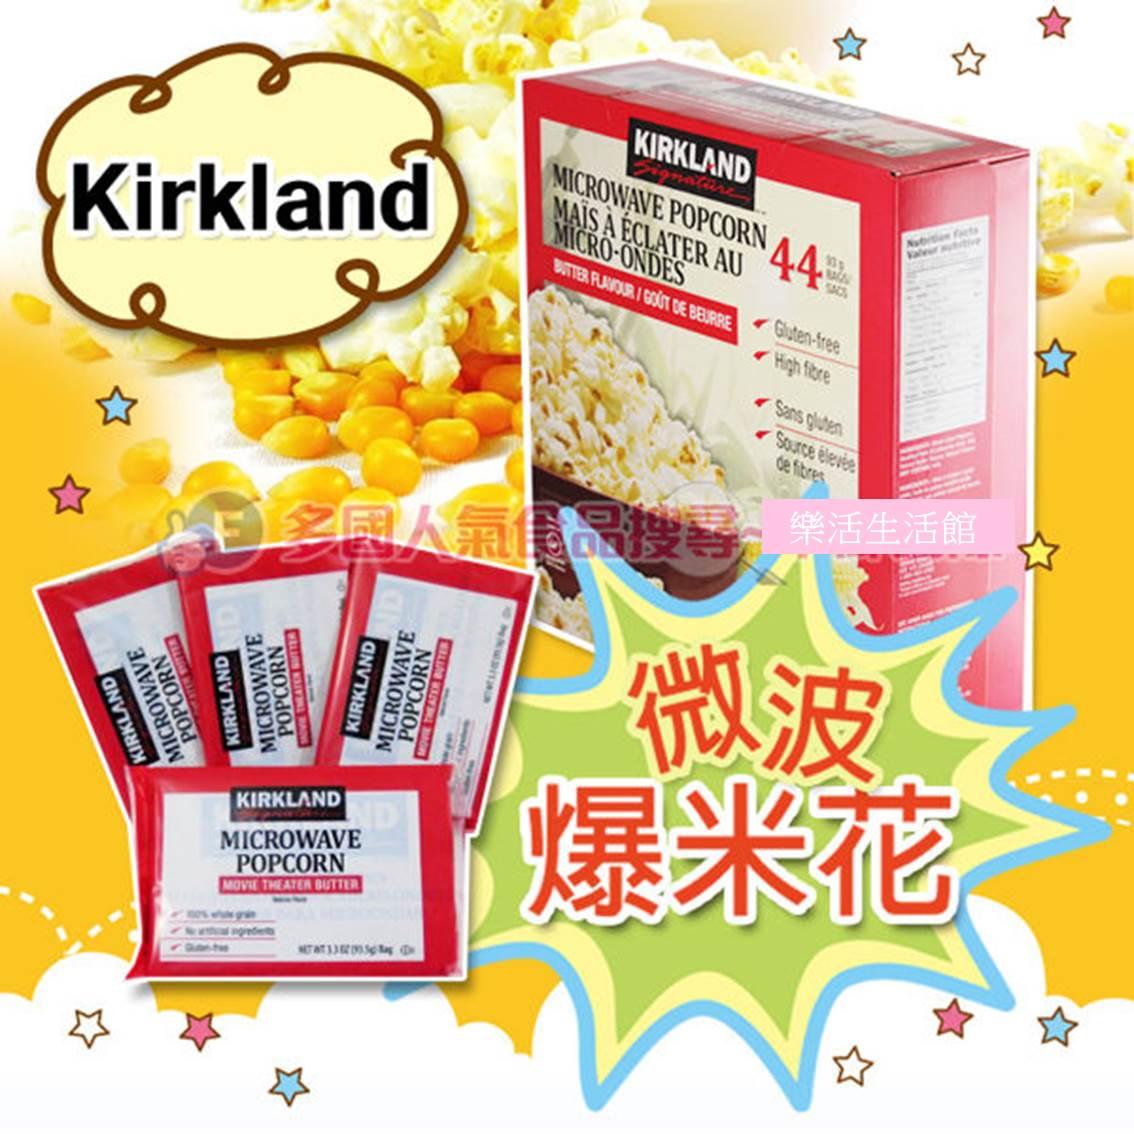 KIRKLAND Signature 科克蘭 奶油口味微波爆米花 【樂活生活館】